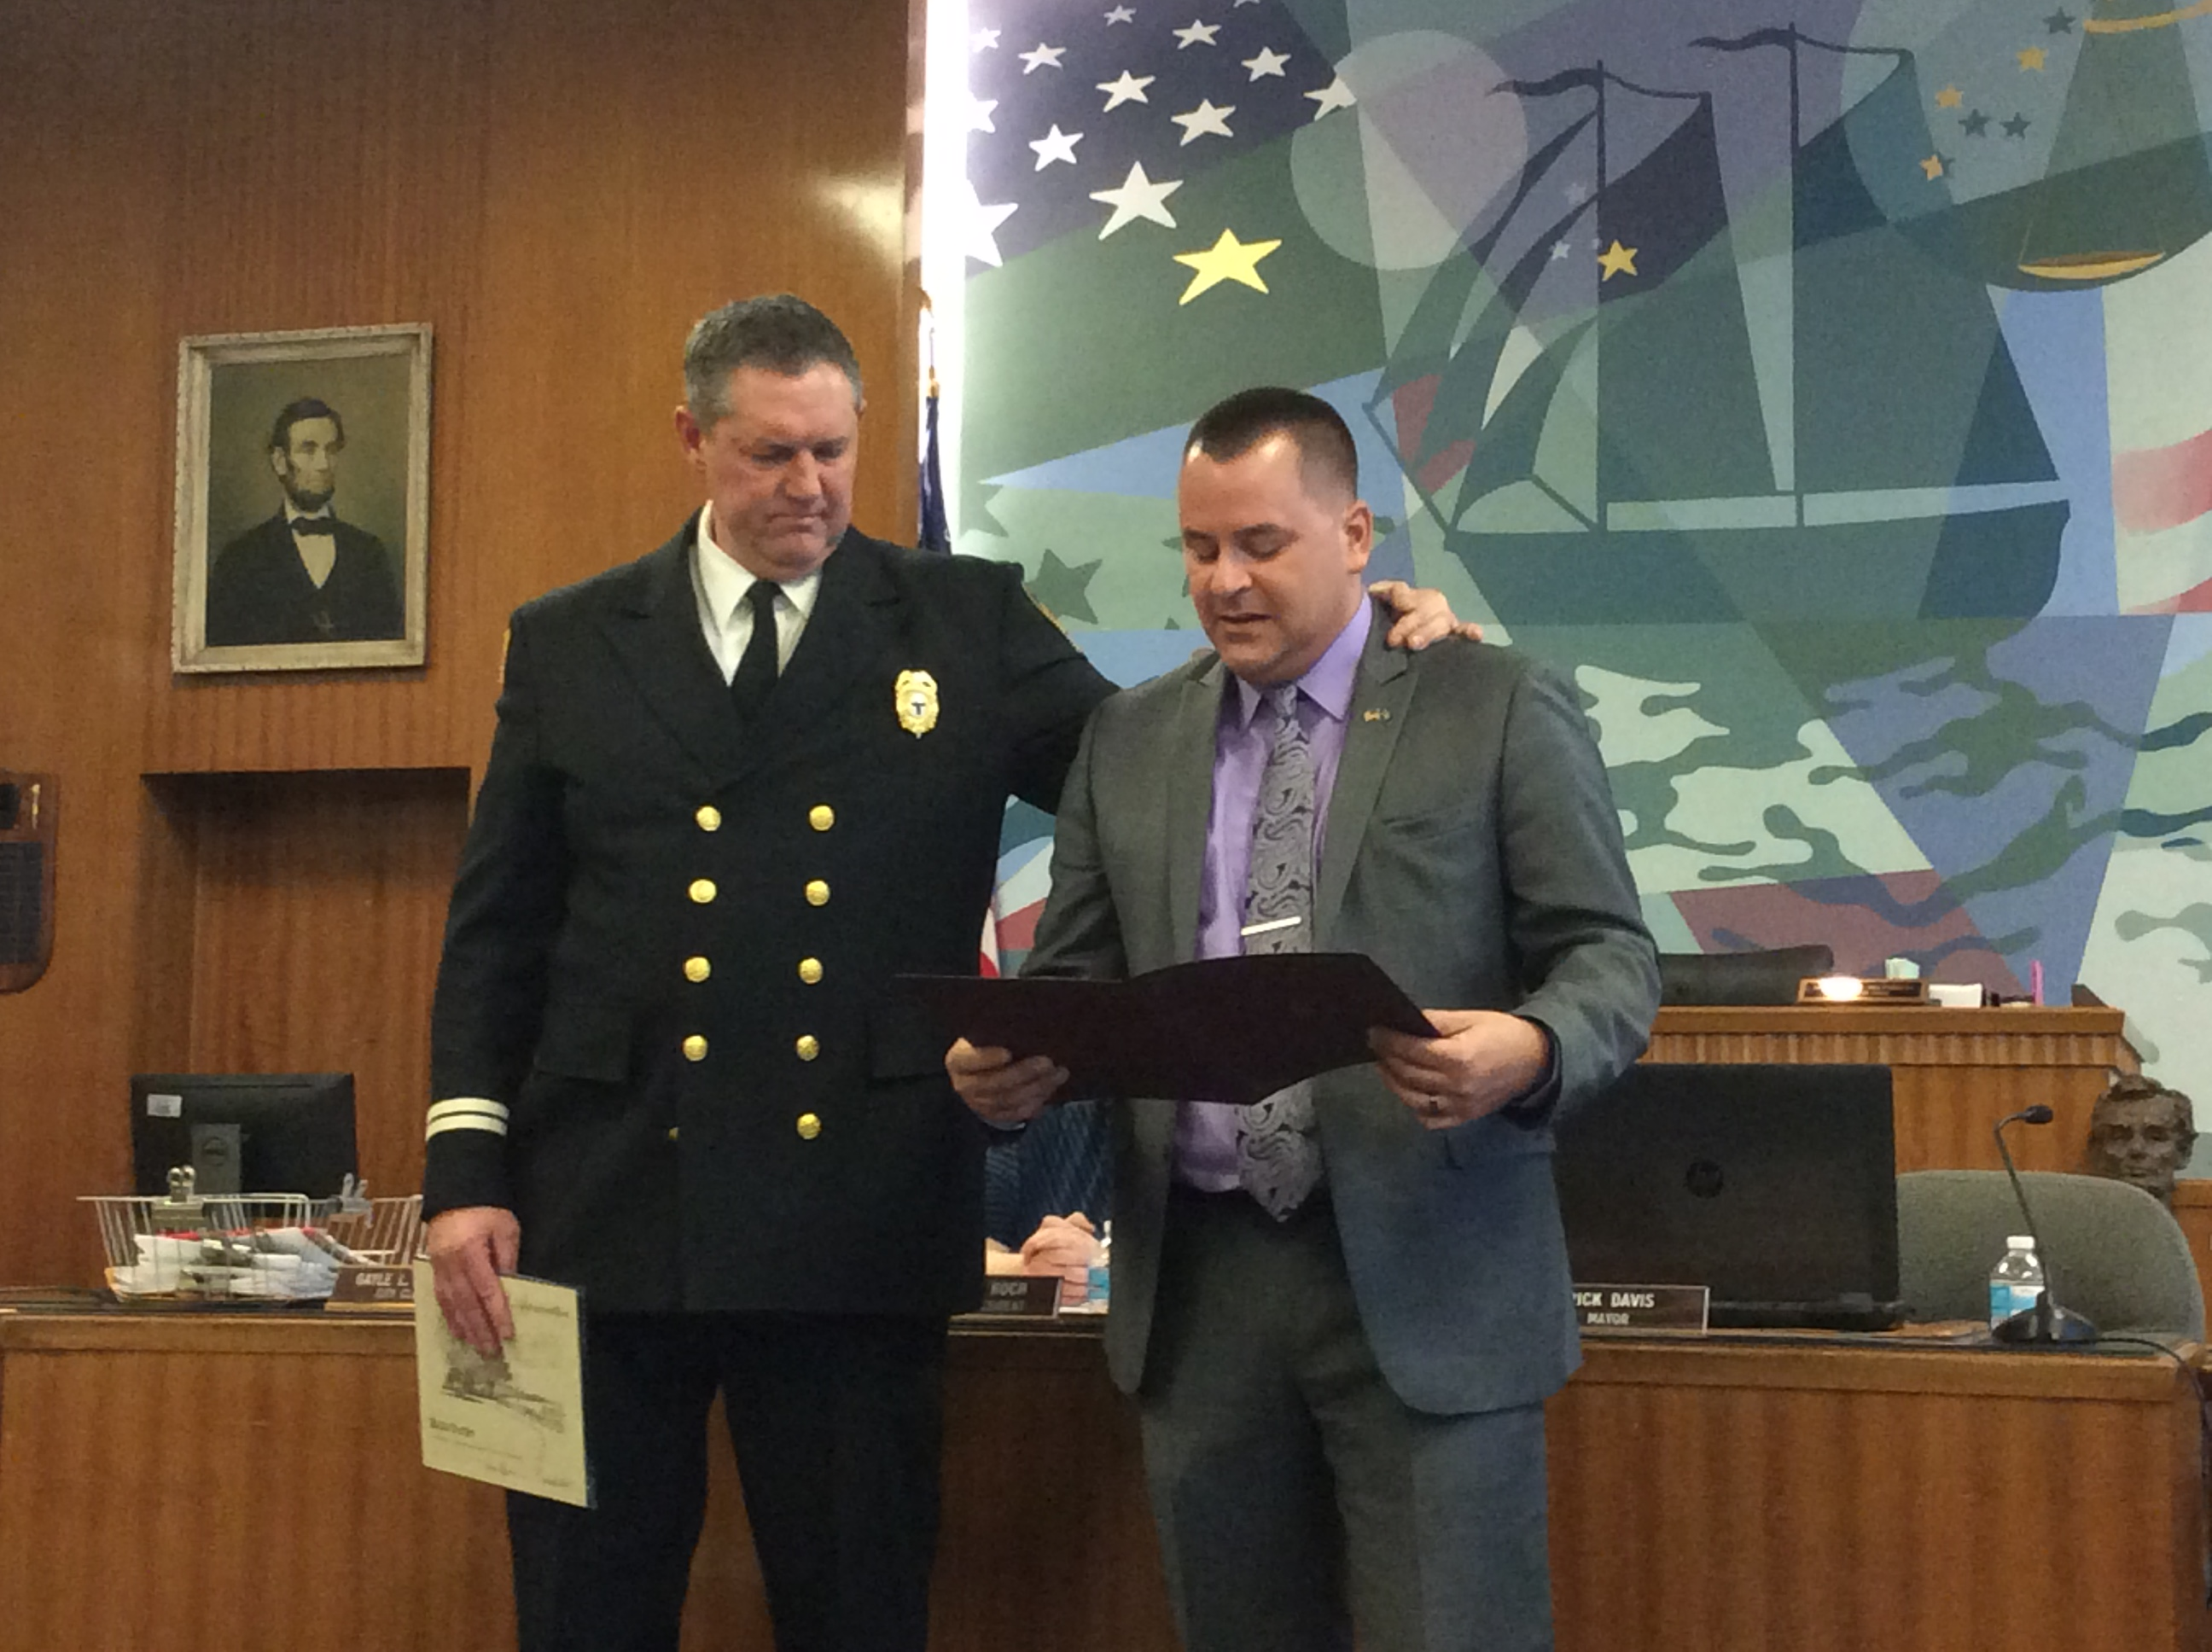 Volunteer firefighter Rick Oates is honored for his service by City of Tonawanda Mayor Rick Davis.